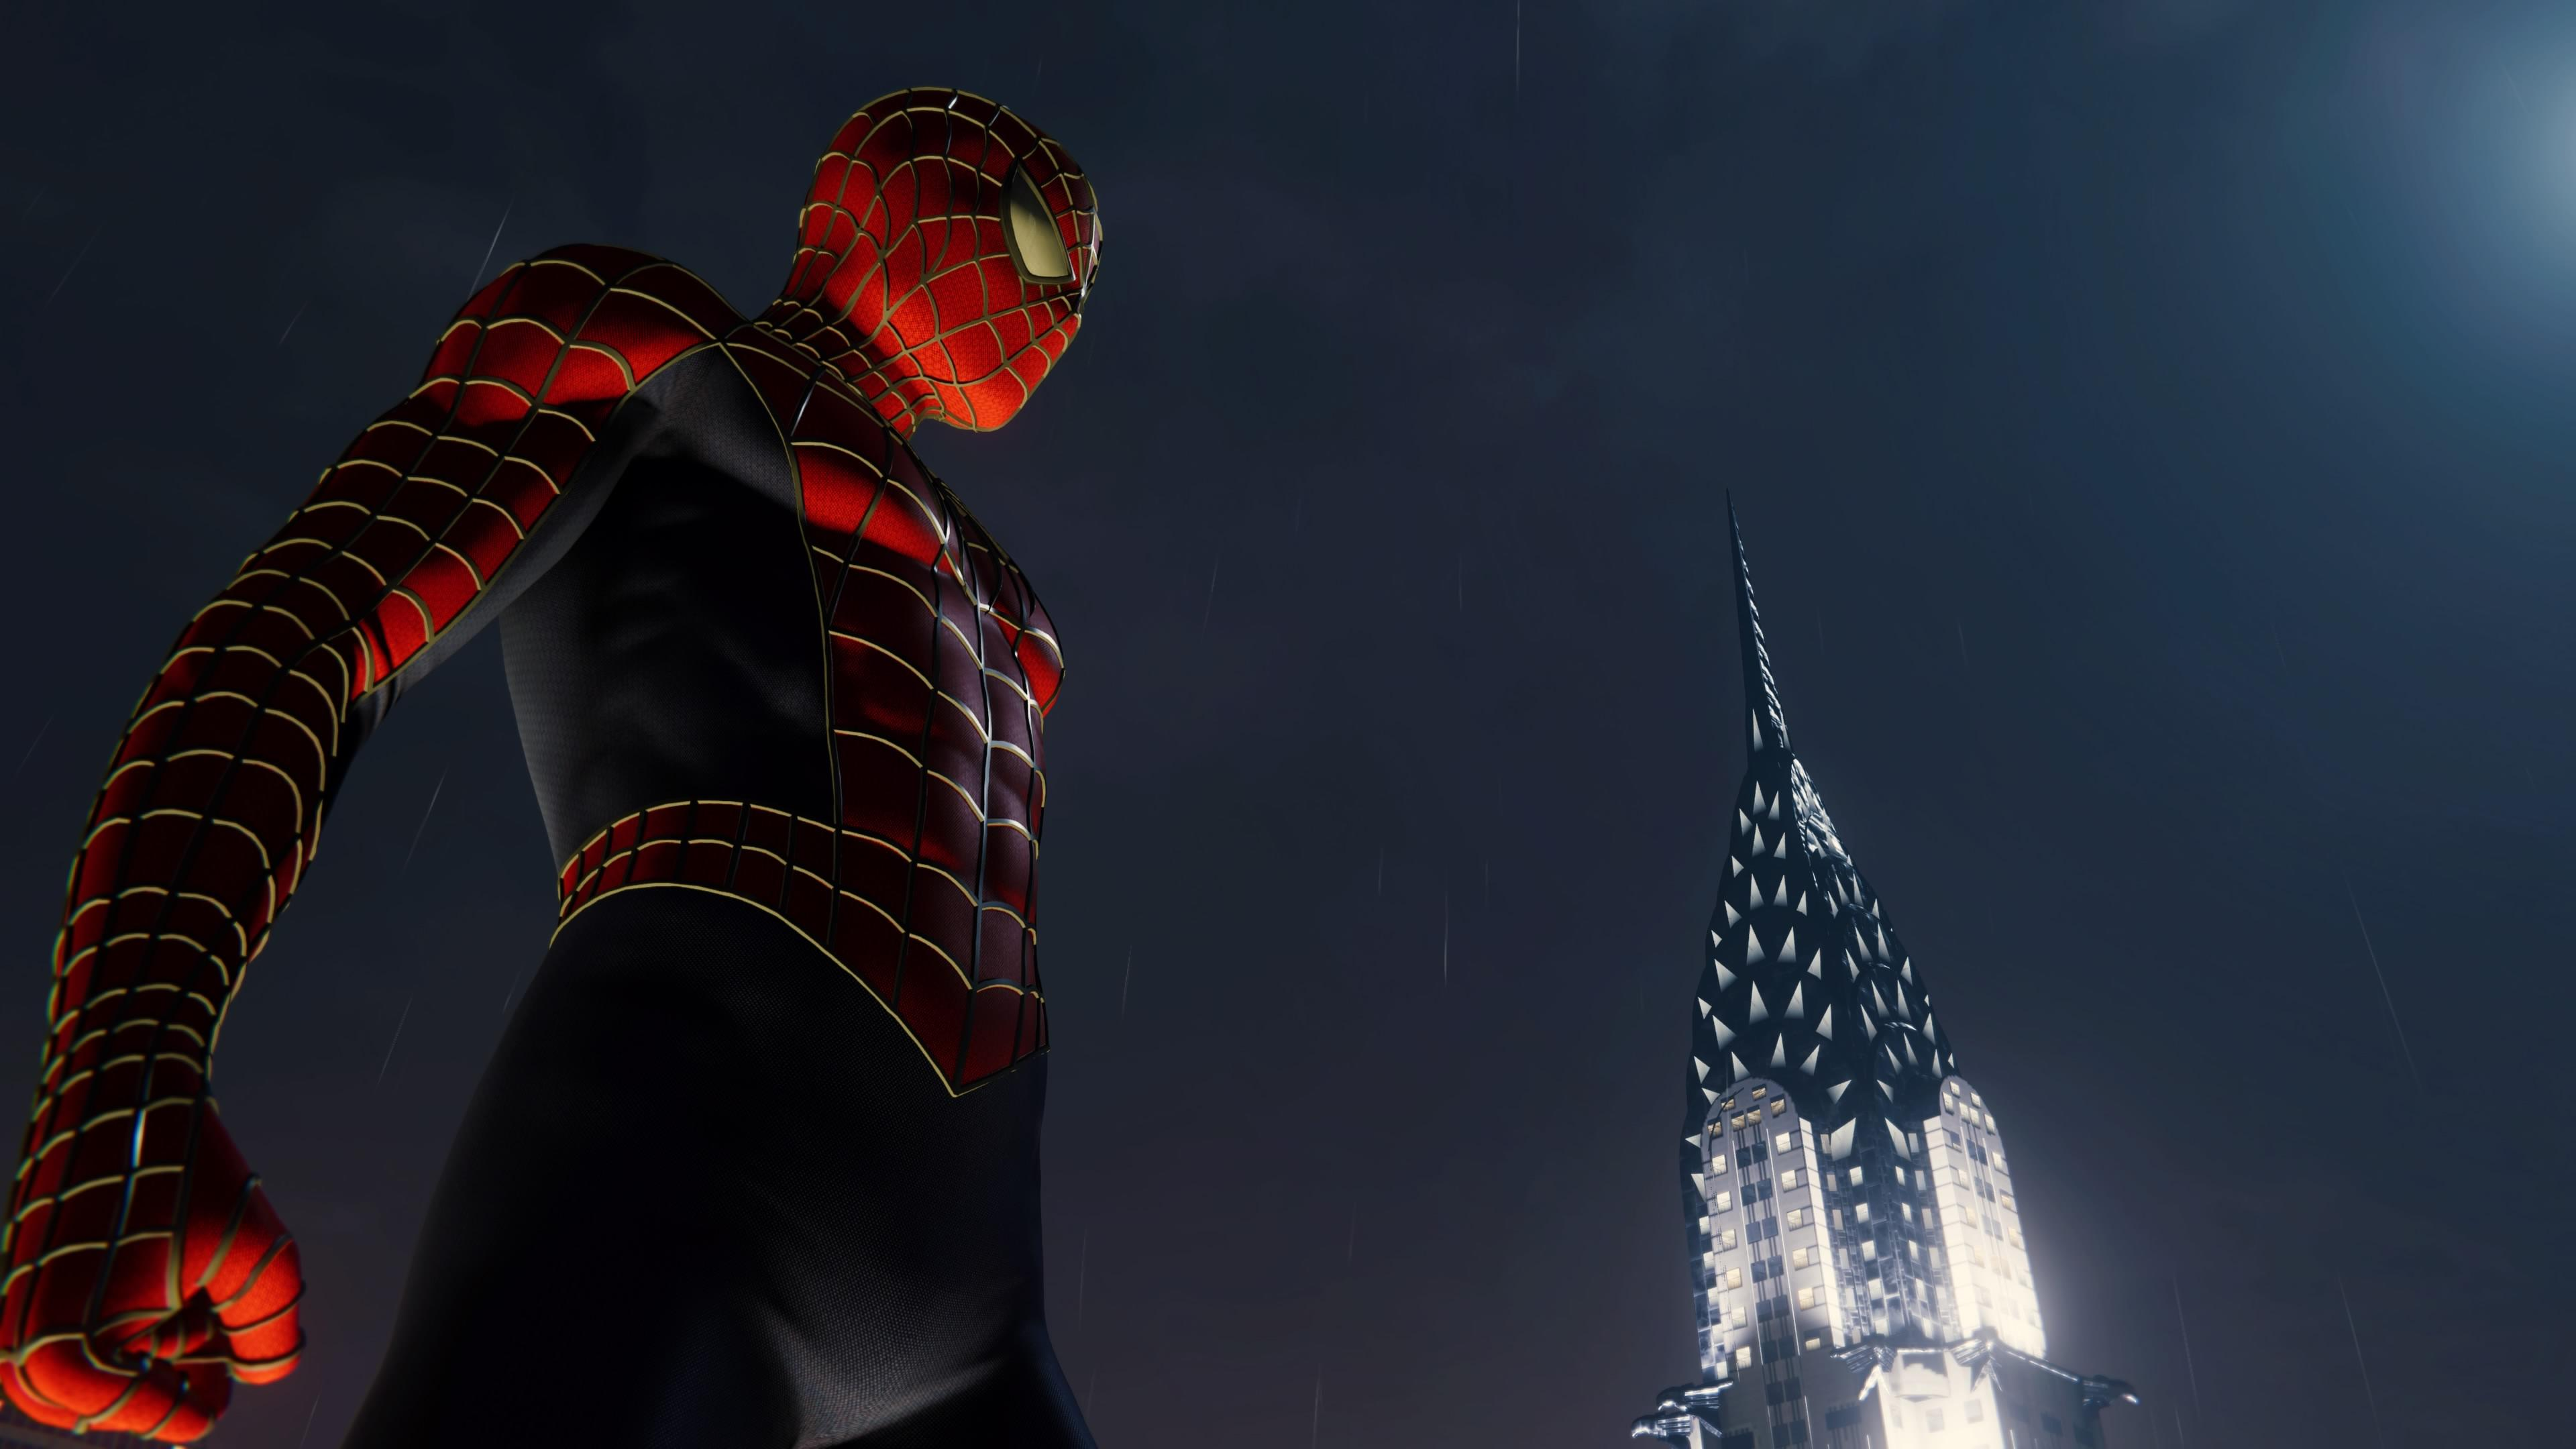 spiderman new york city 4k 1547938565 - Spiderman New York City 4k - superheroes wallpapers, spiderman wallpapers, spiderman ps4 wallpapers, ps games wallpapers, hd-wallpapers, games wallpapers, 4k-wallpapers, 2018 games wallpapers